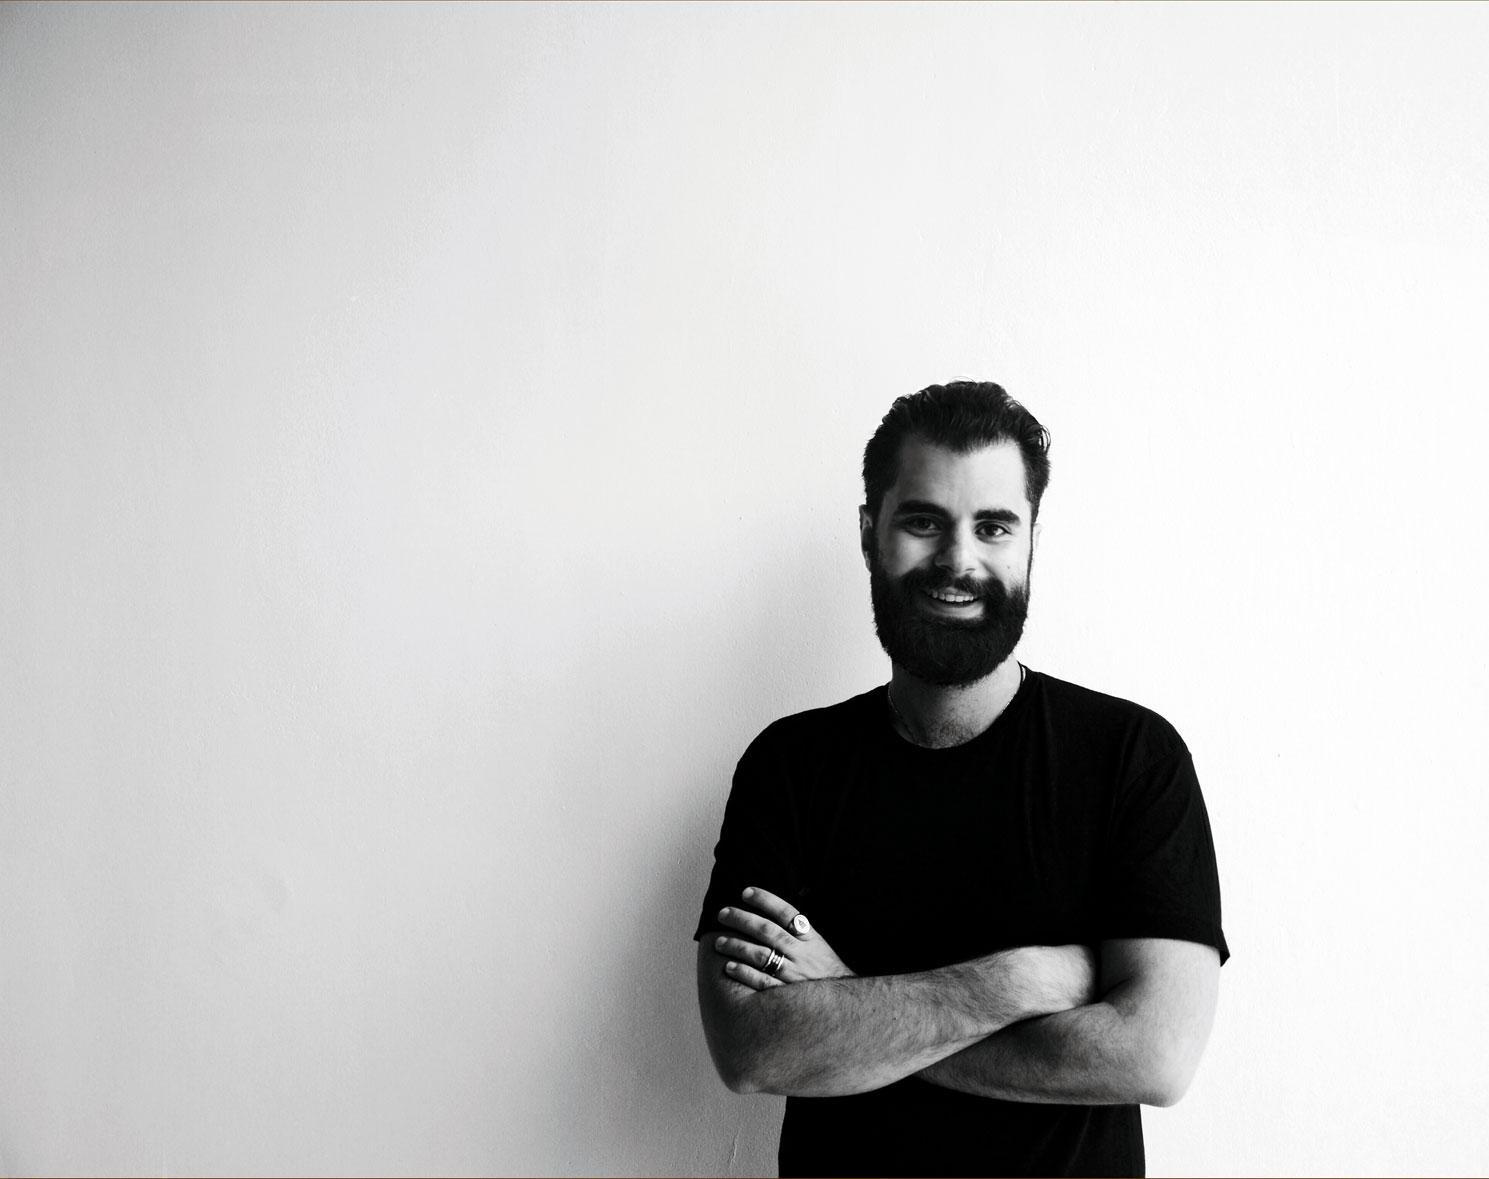 Zaid Farouki